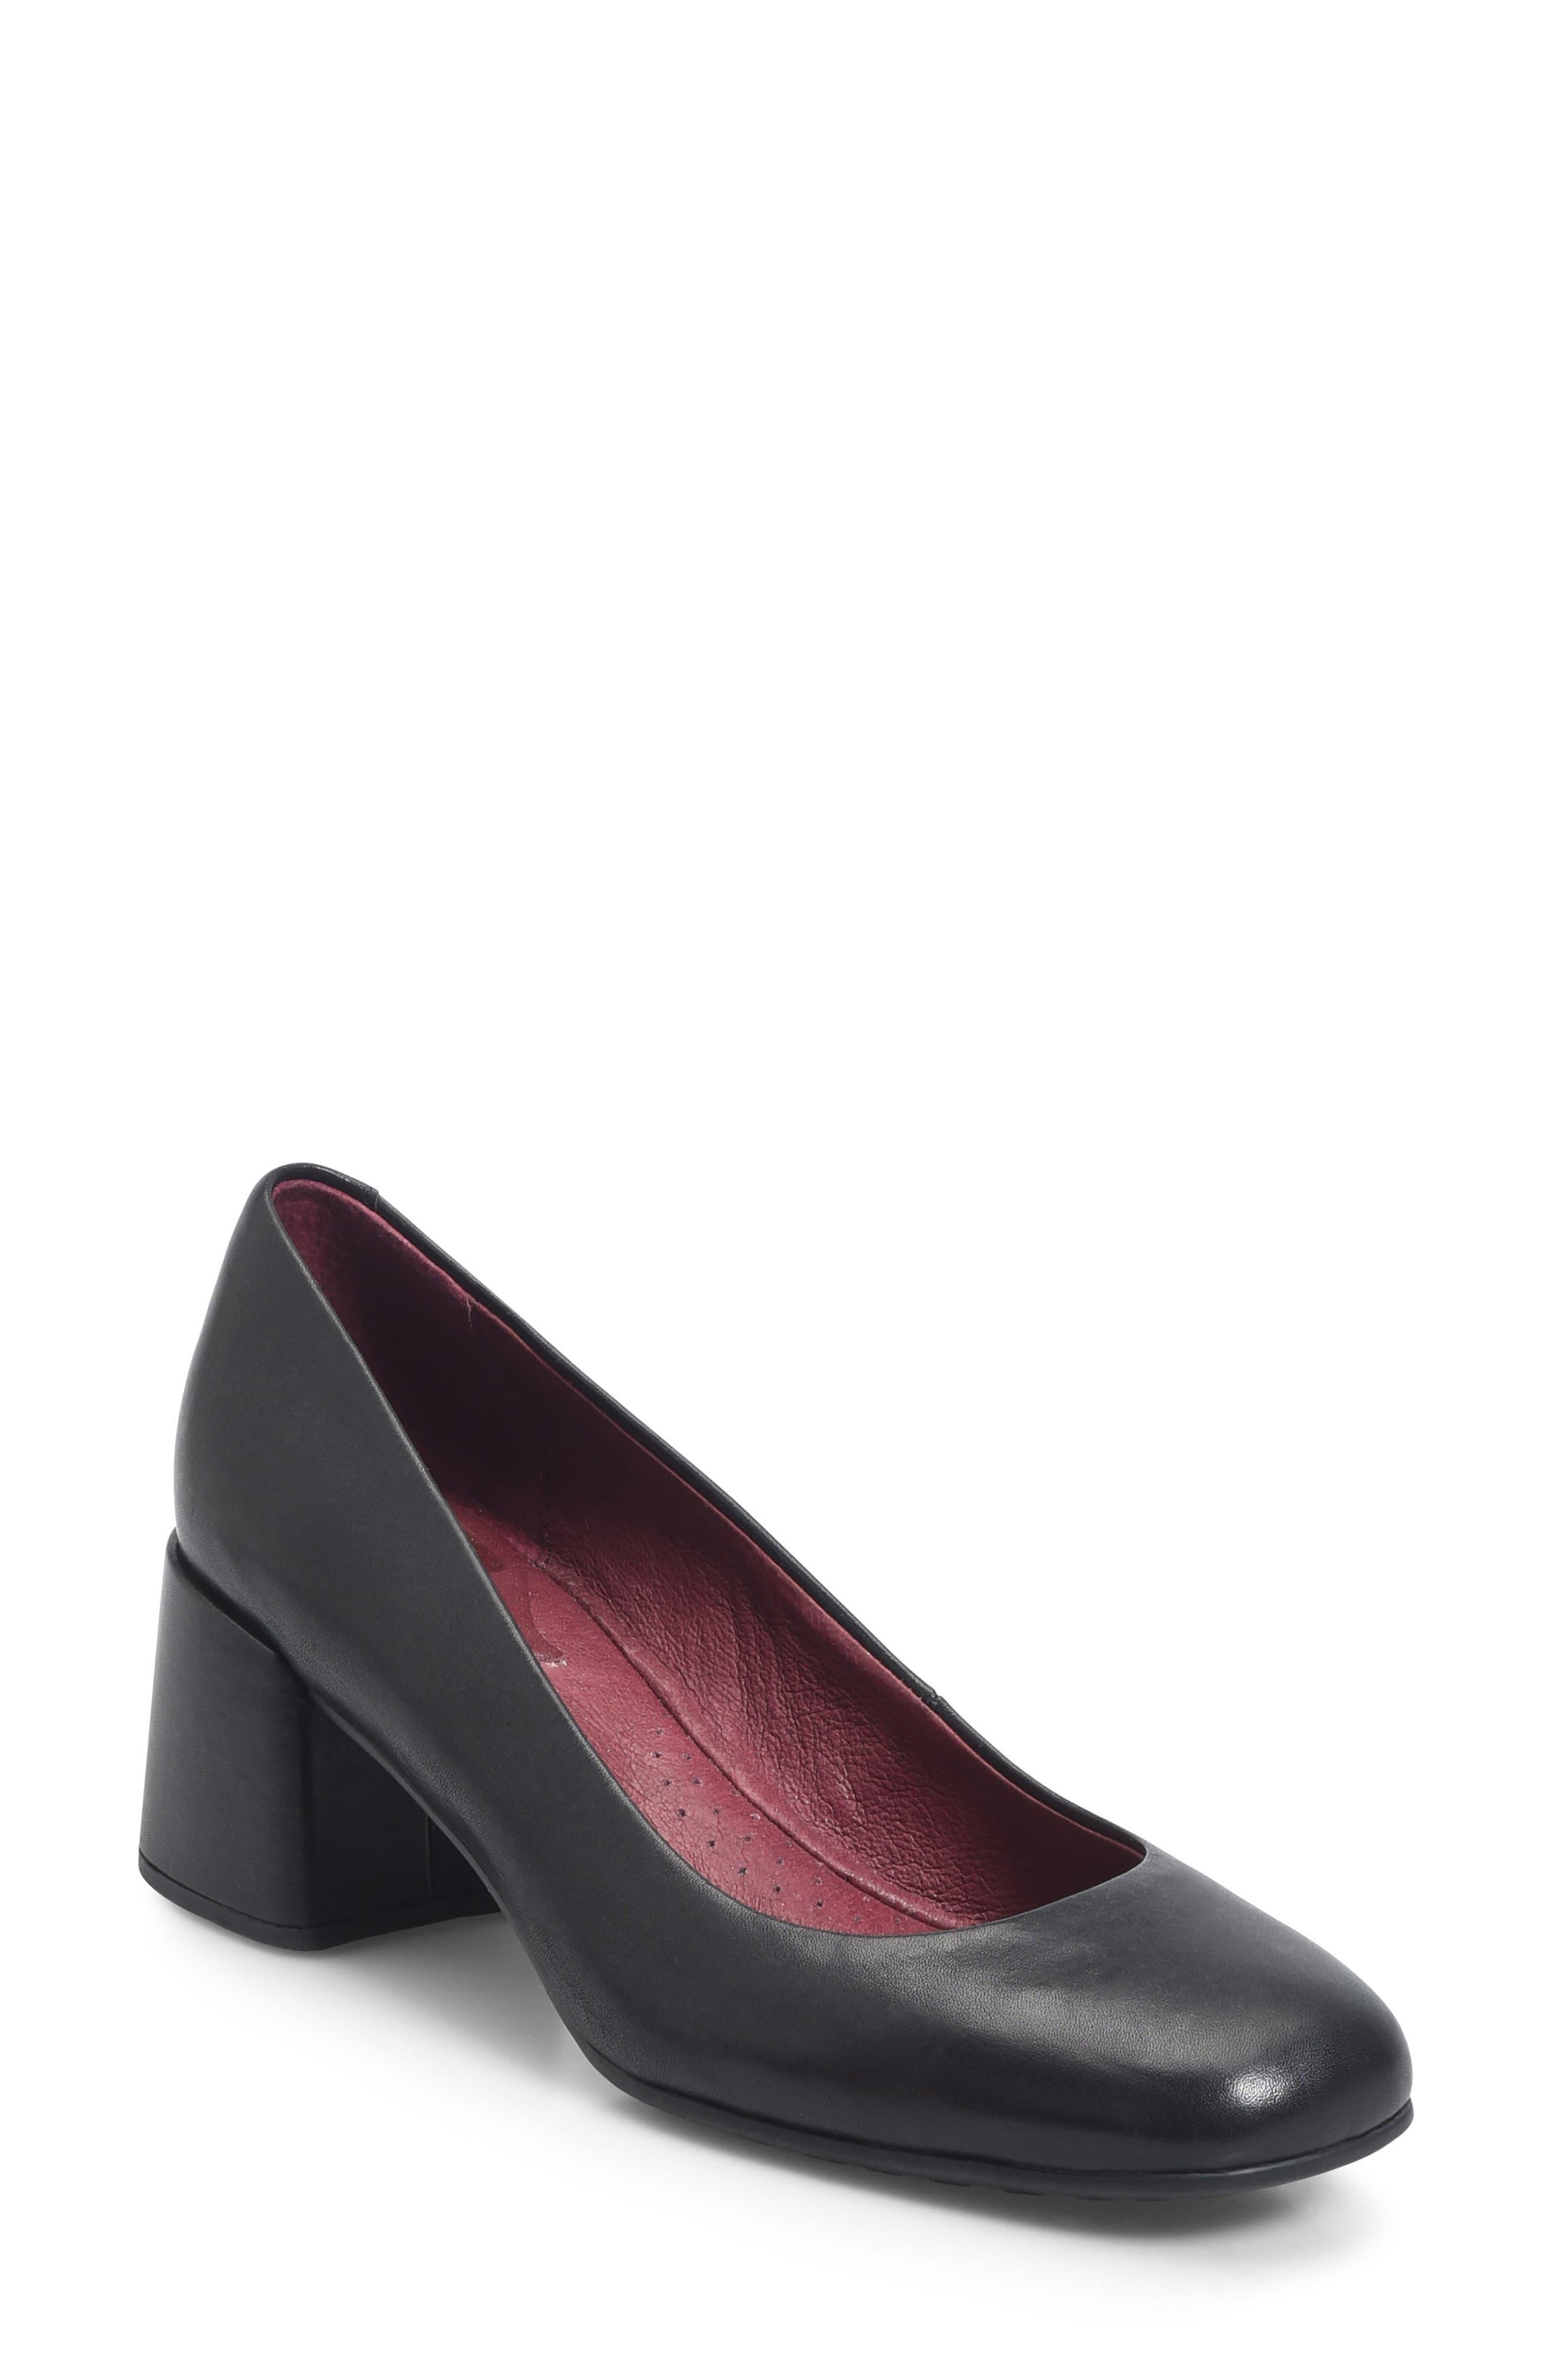 Magnolia Block Heel Pump,                         Main,                         color, Black Leather